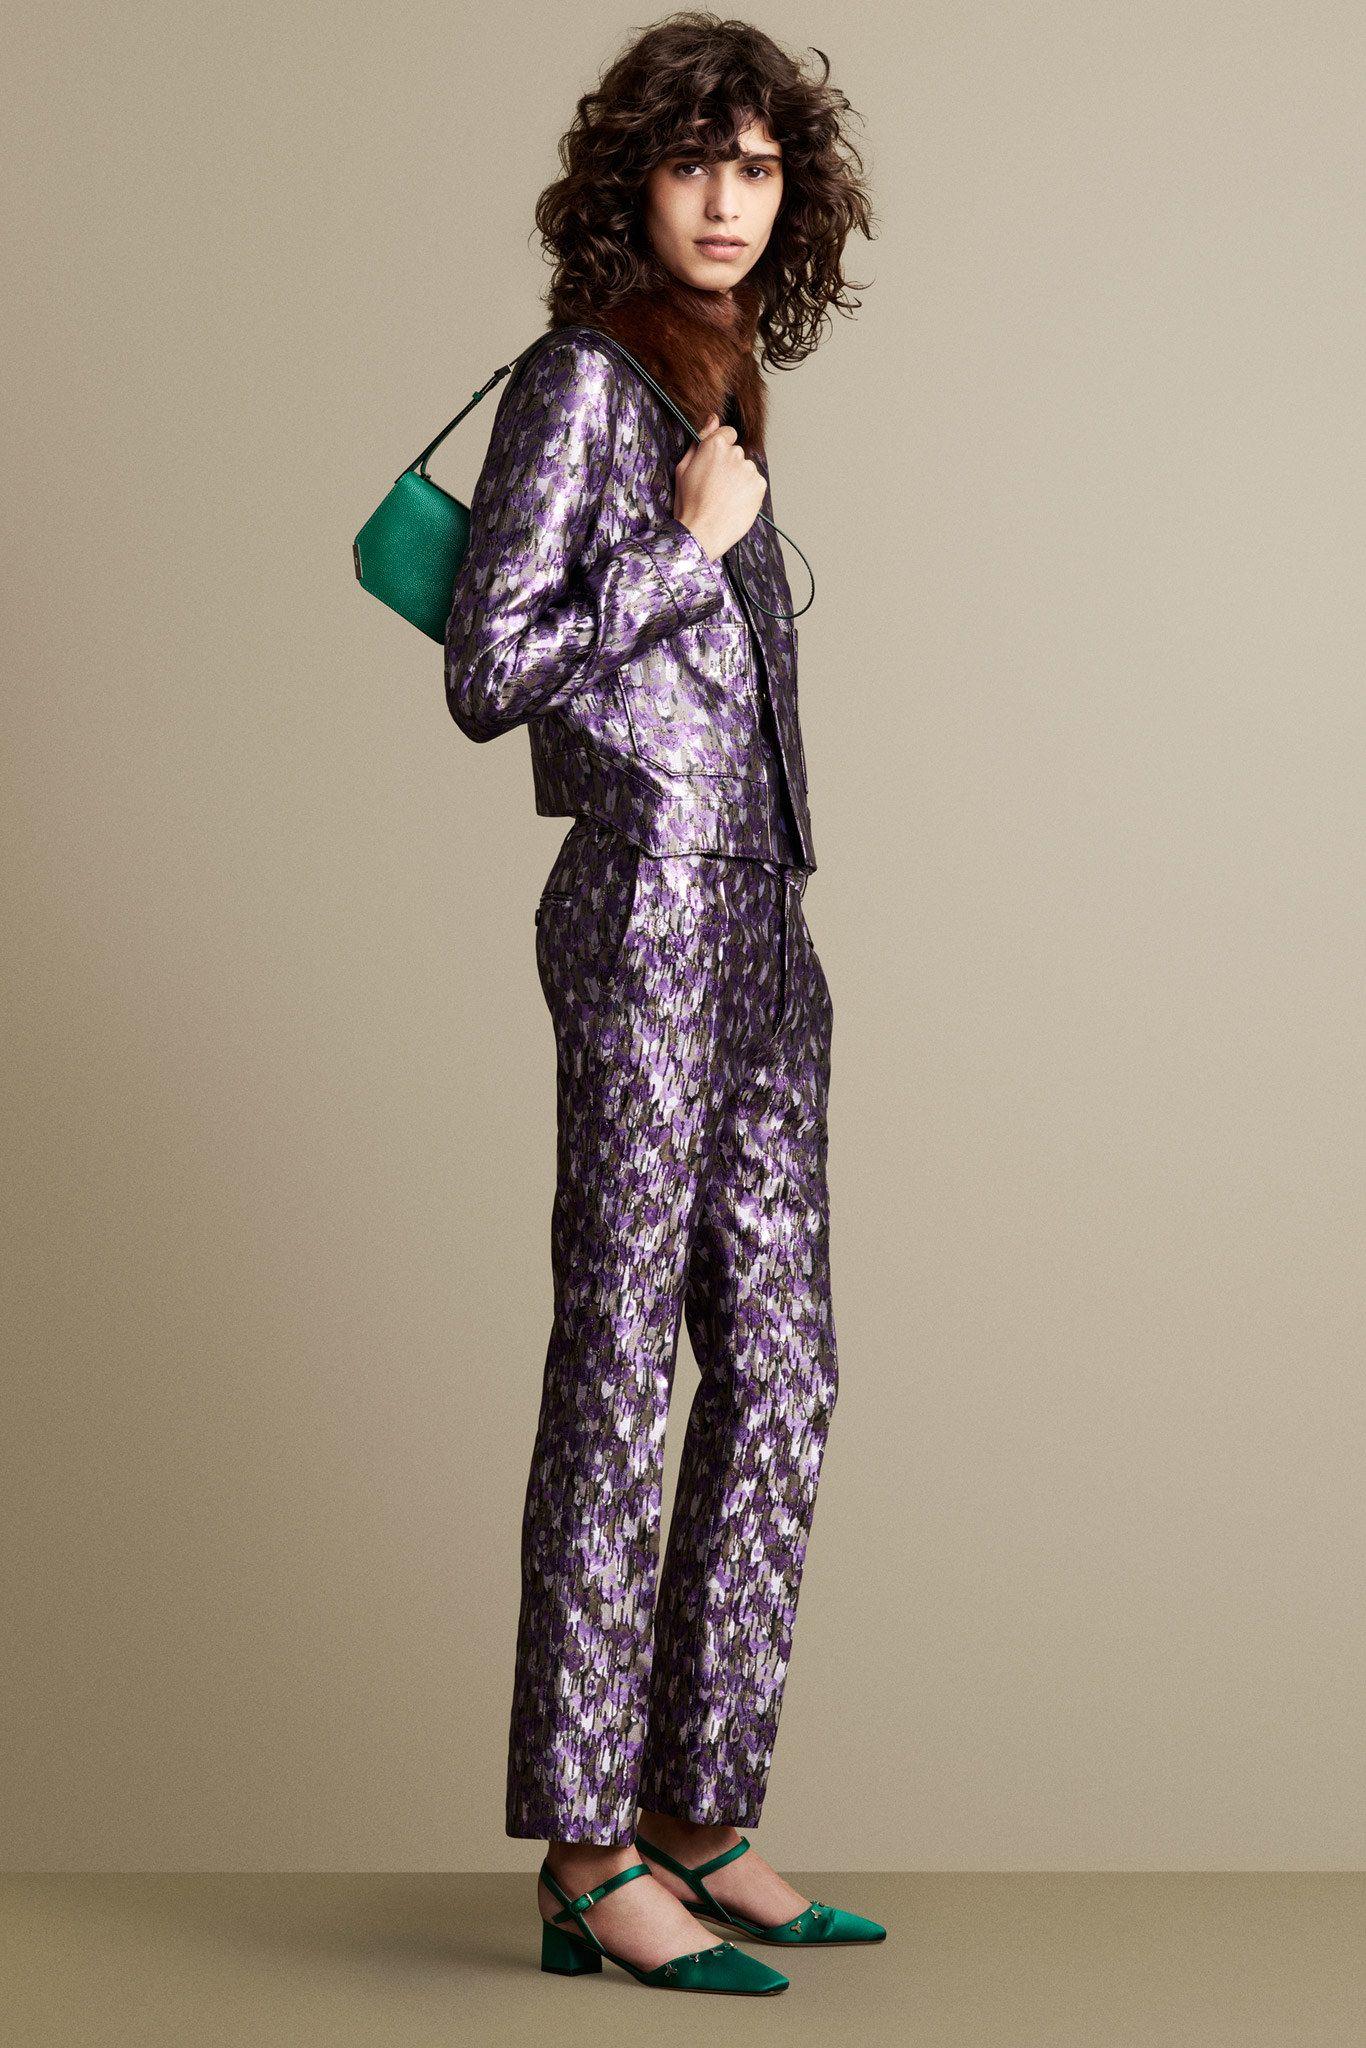 Trend I fashion I I spring summer 2016 I sequins I metallic women's suit I purple women's suit I green silk pumps I green leather bag I violet sequin print I Bally Spring Summer 2016 Lookbook @monstylepin